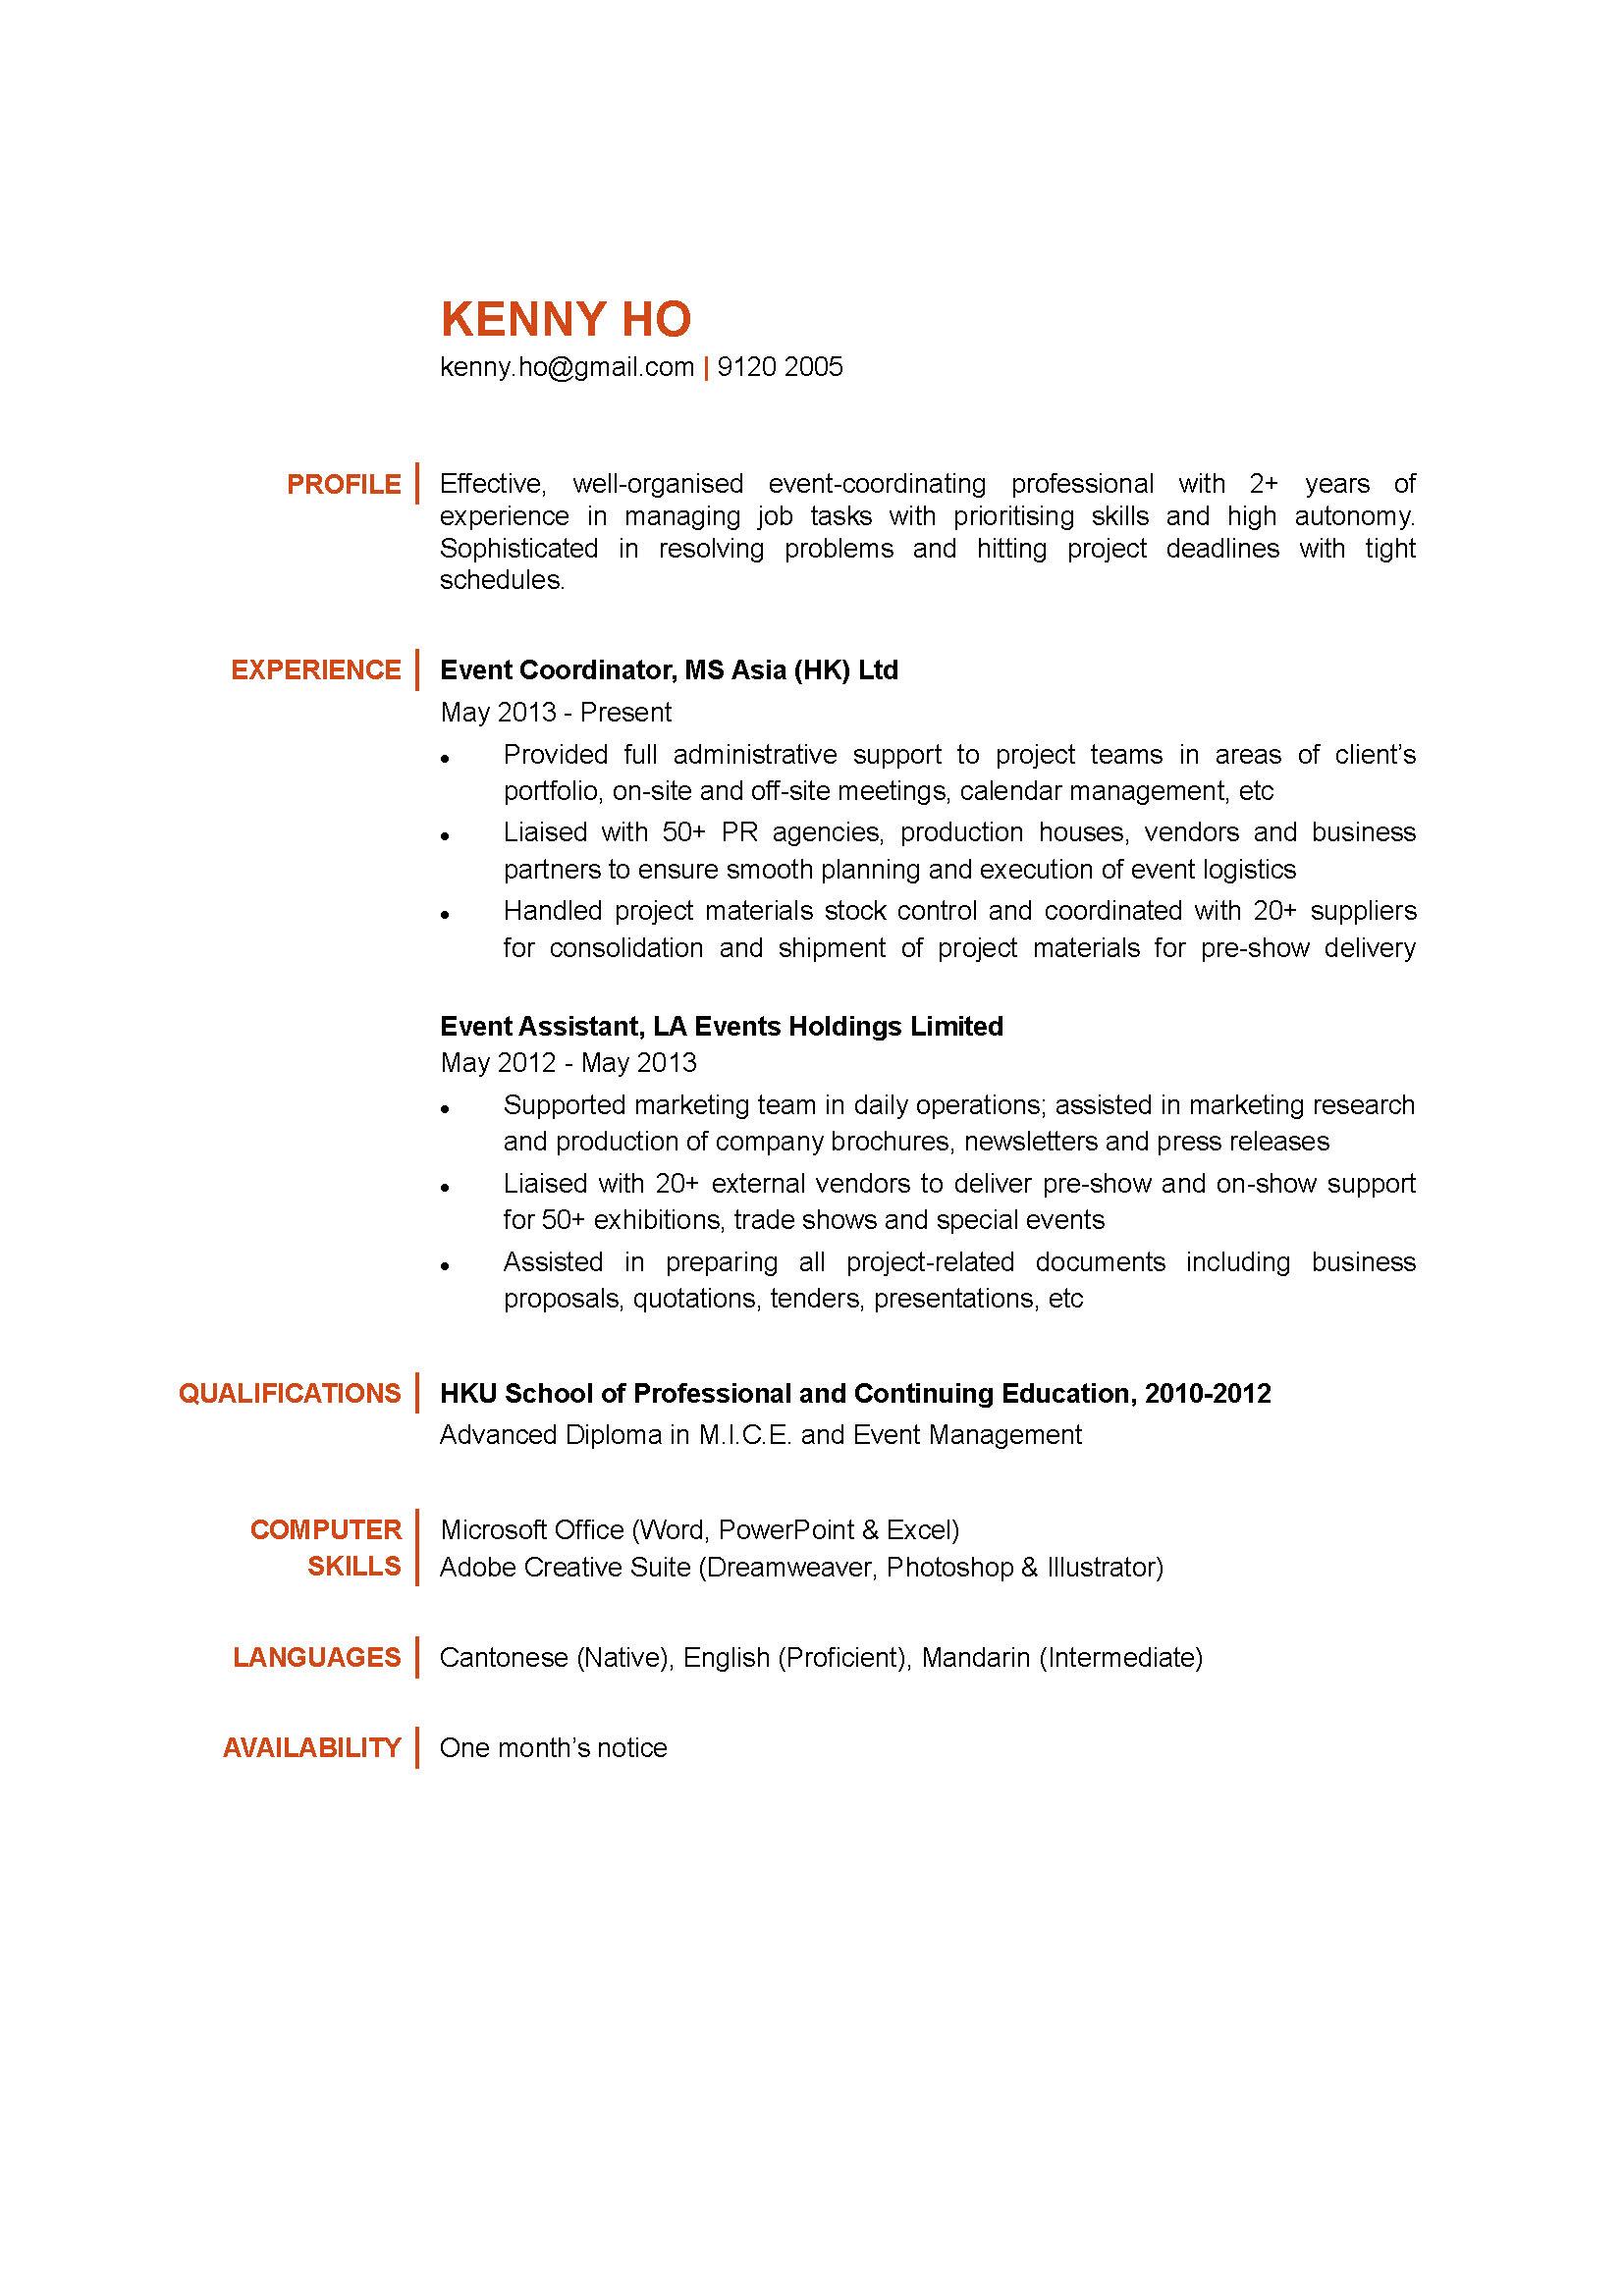 Event Coordinator CV   CTgoodjobs powered by Career Times